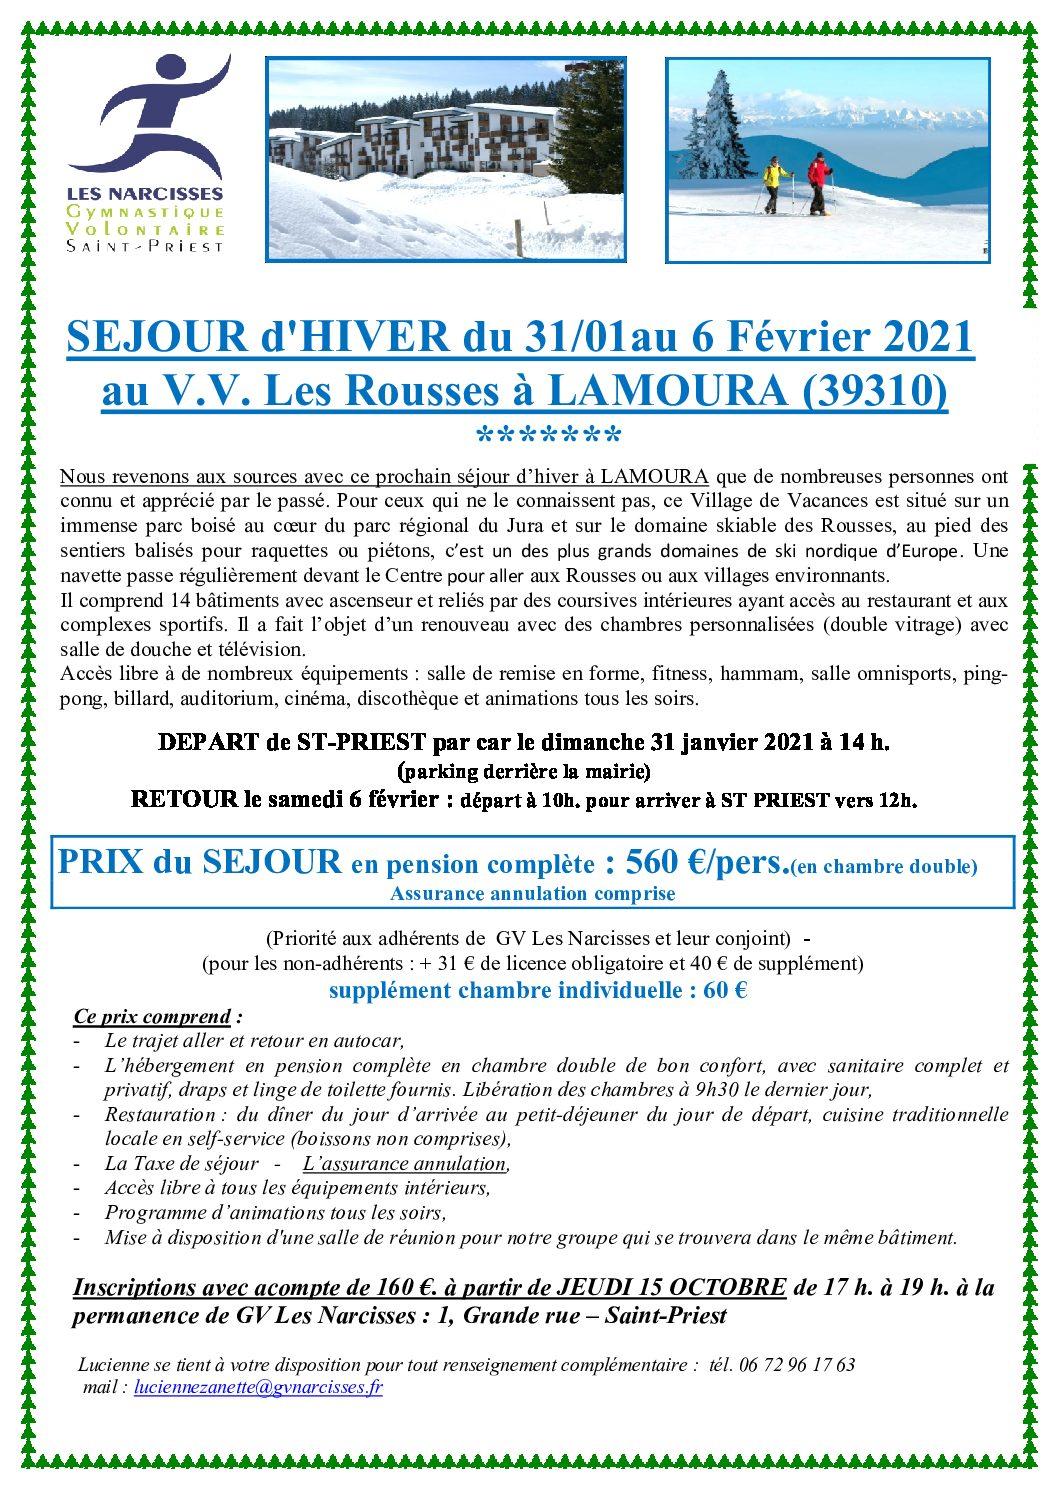 SEJOUR D'HIVER A LAMOURA (Jura)